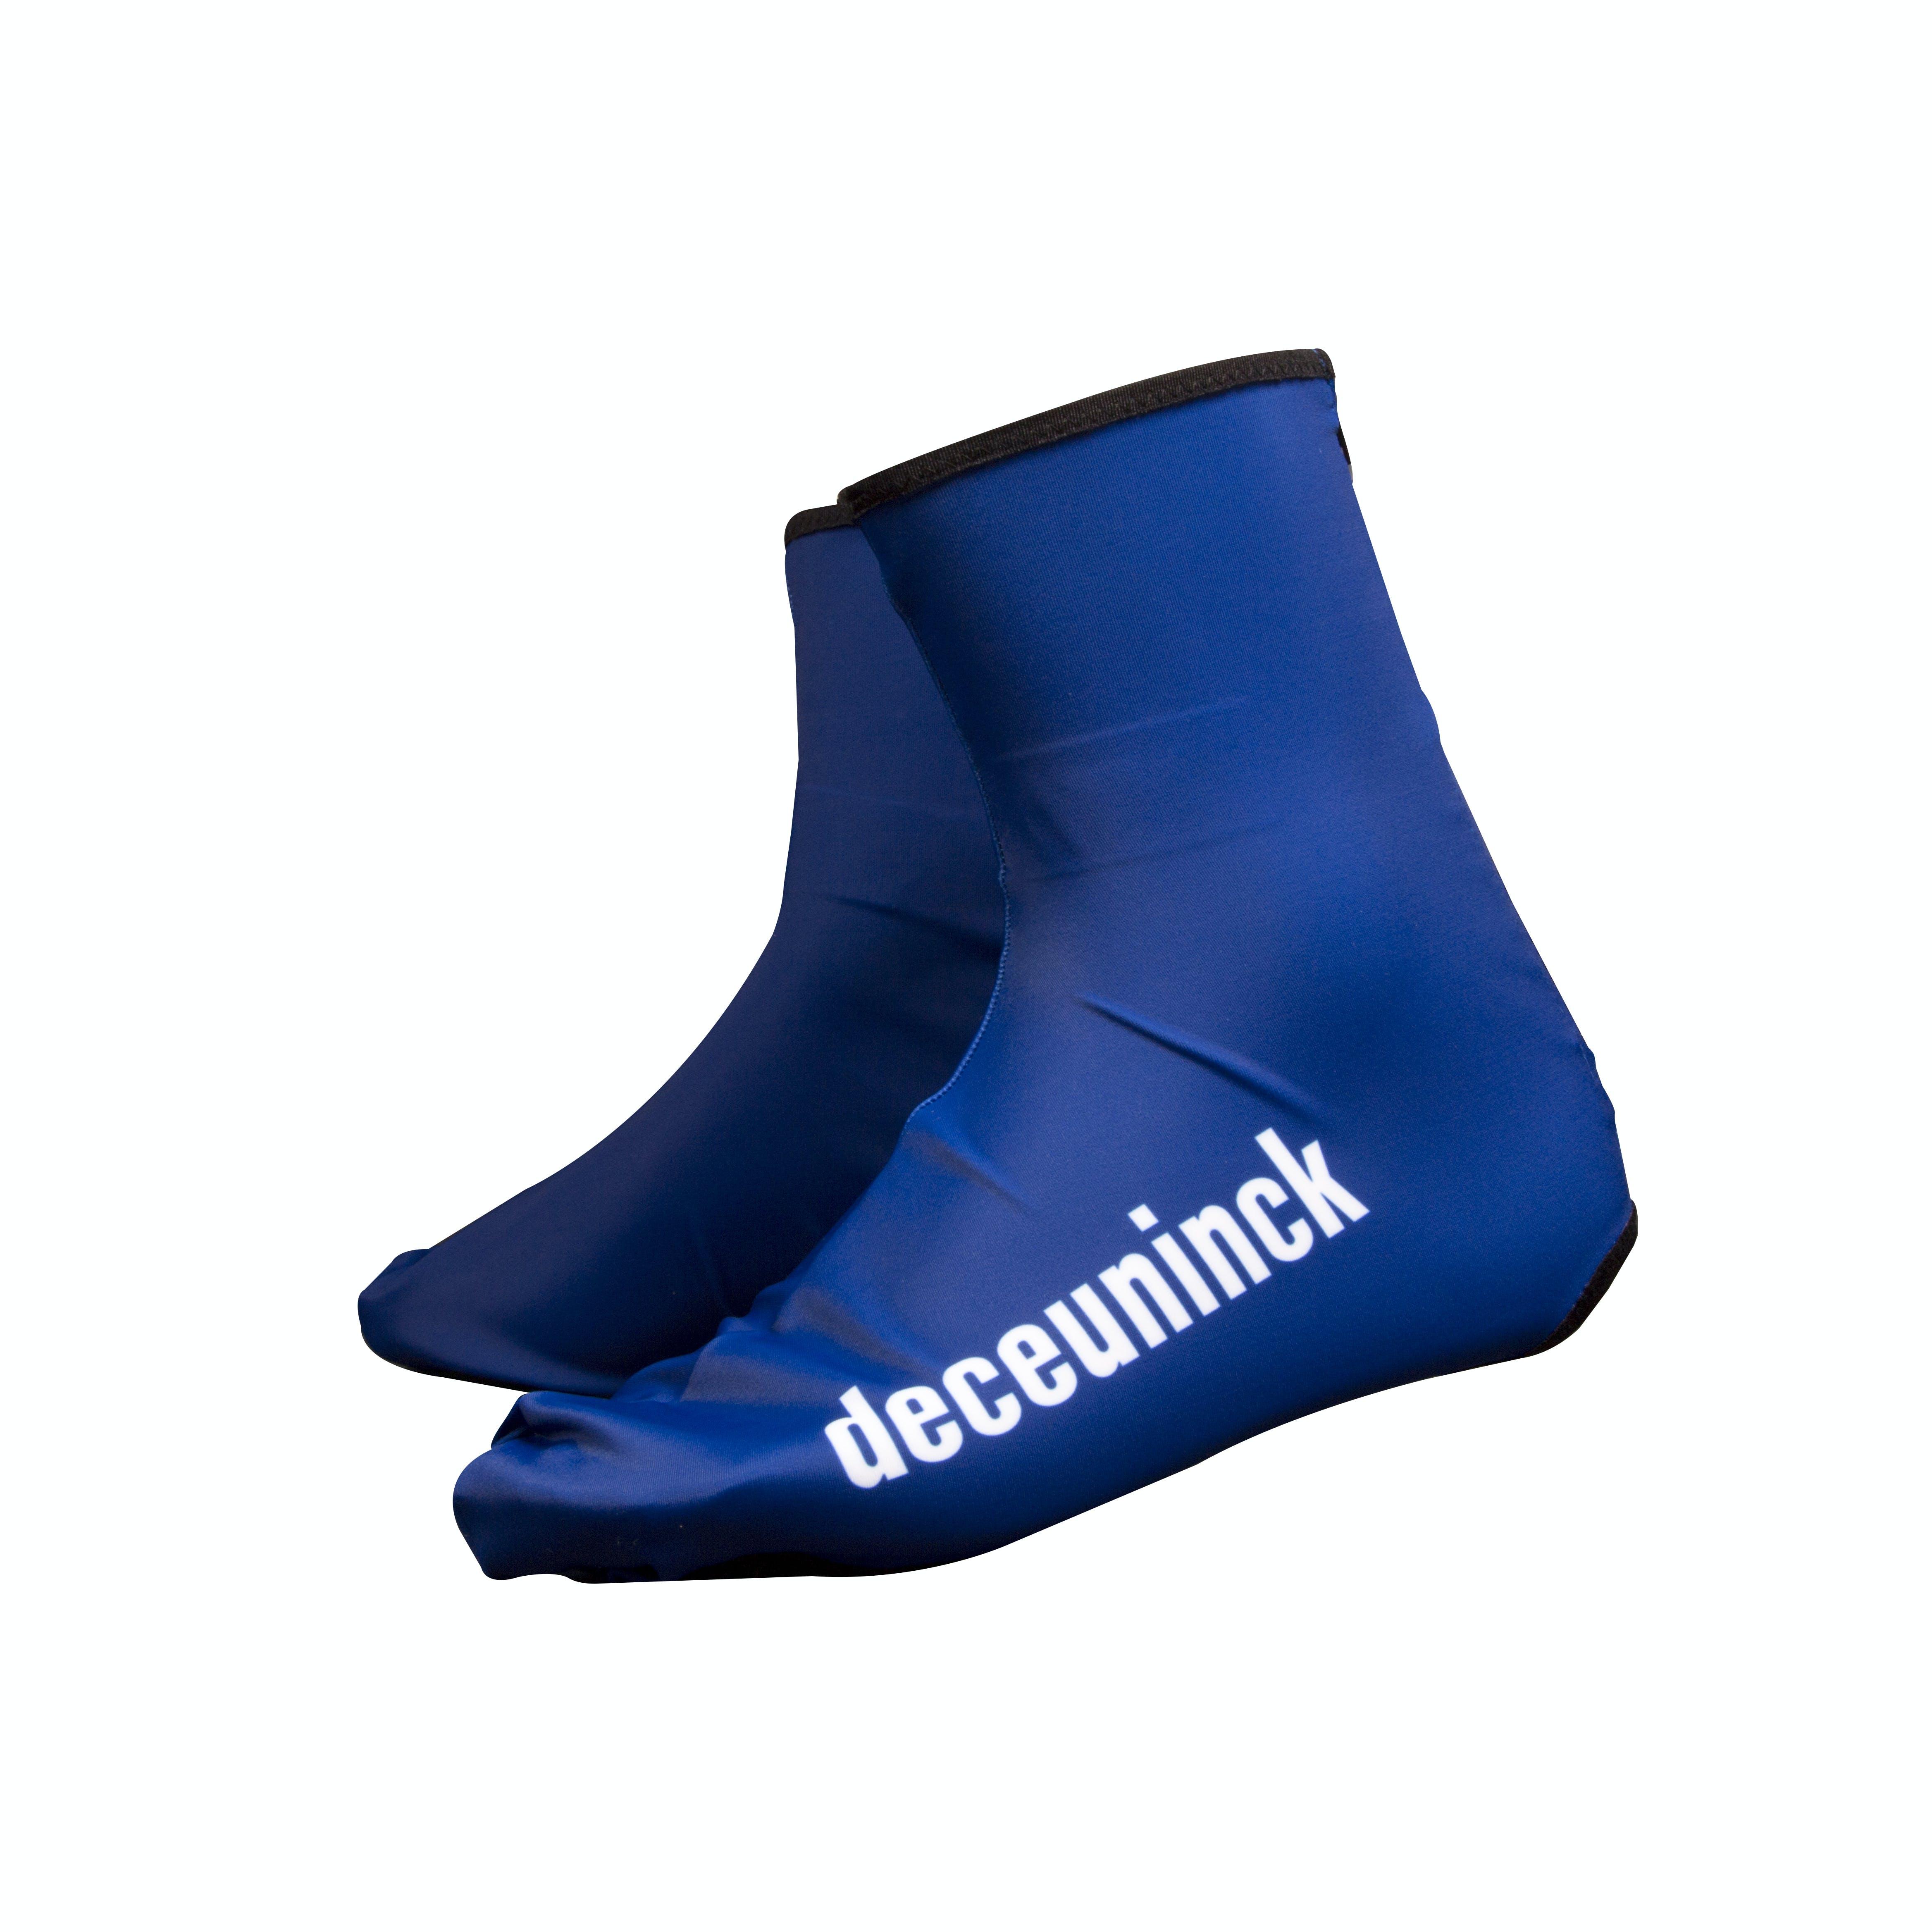 Deceuninck Quick-Step 2020 Schoenovertrek Lycra